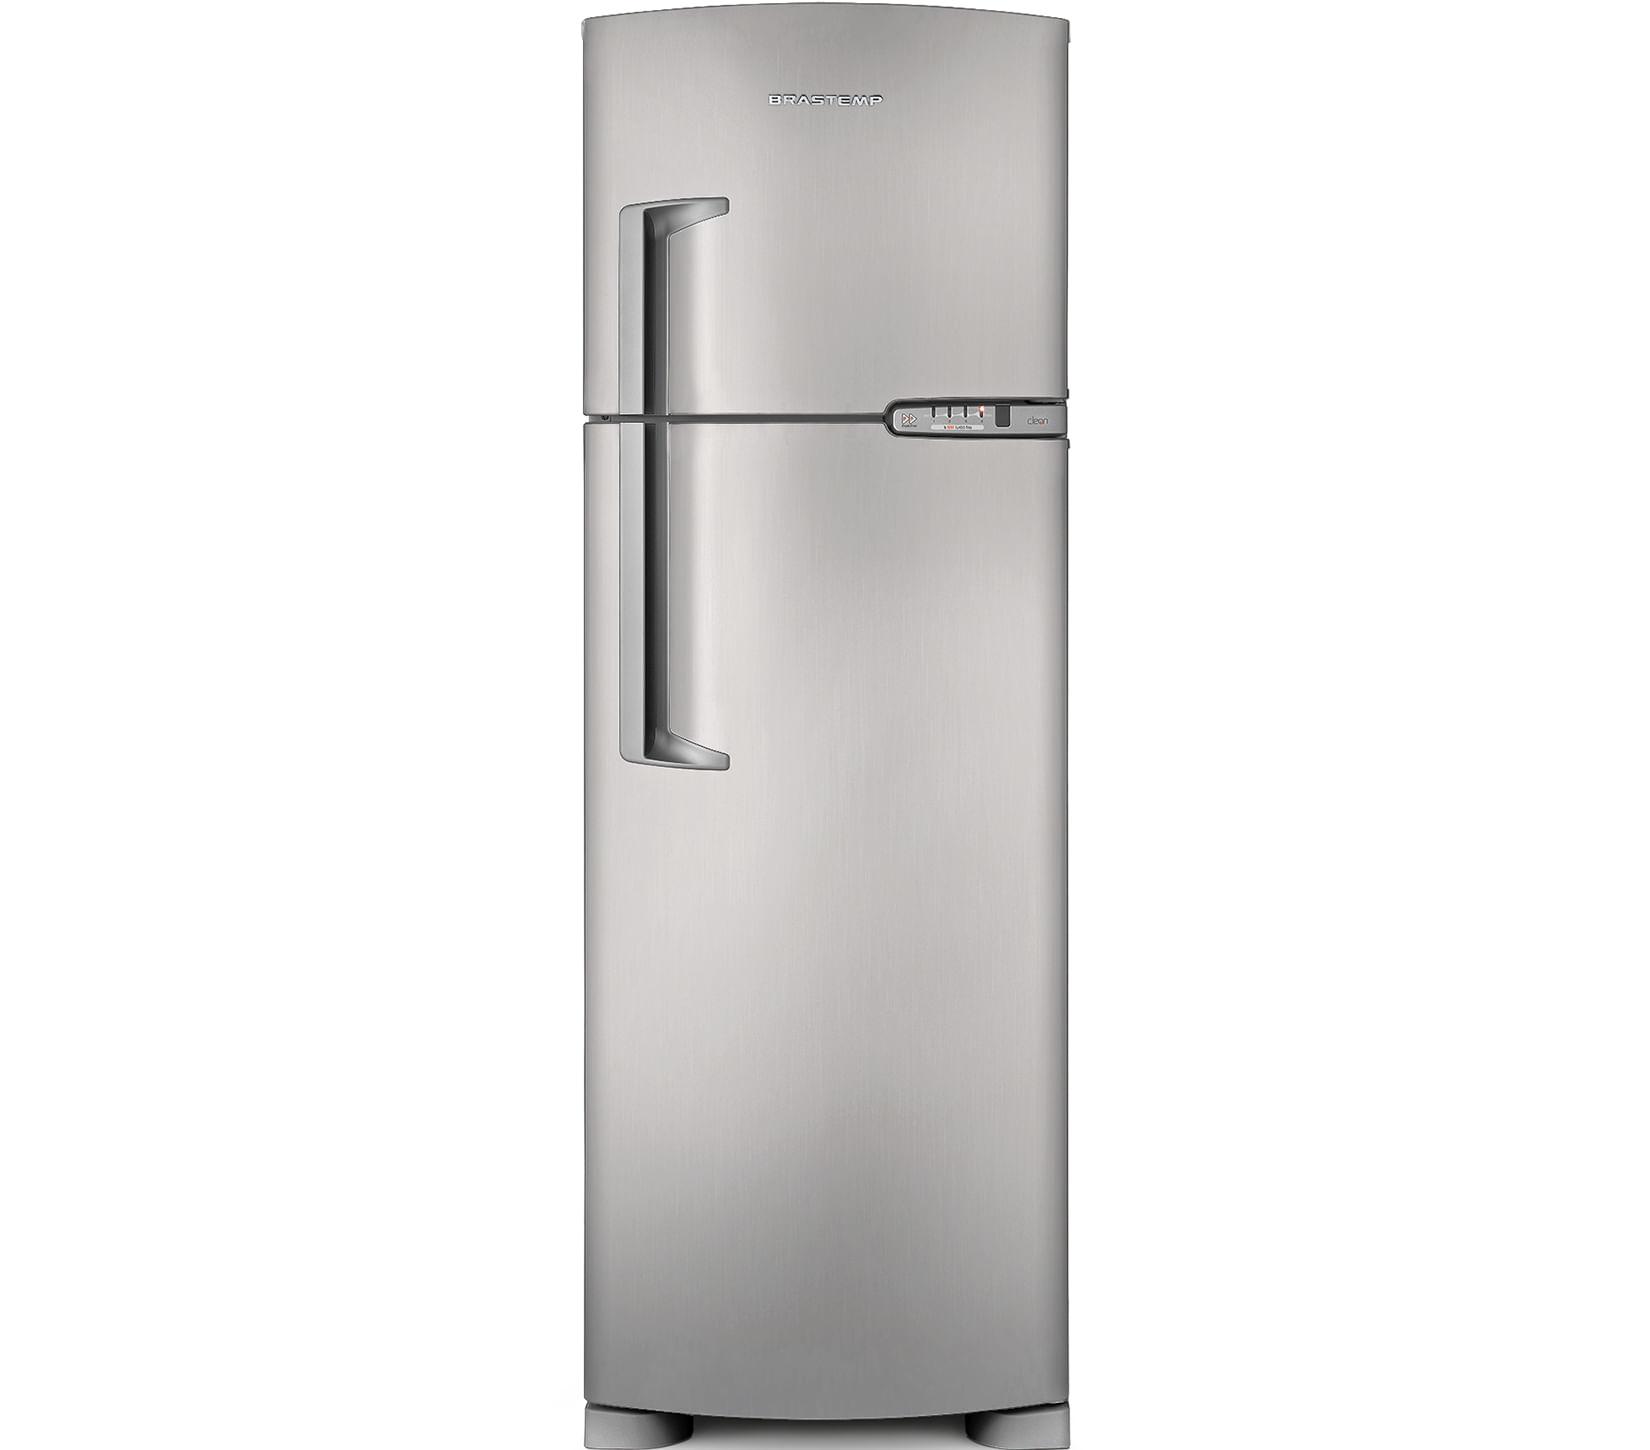 Geladeira Brastemp Frost Free Duplex 378 litros cor Inox com Porta-Latas